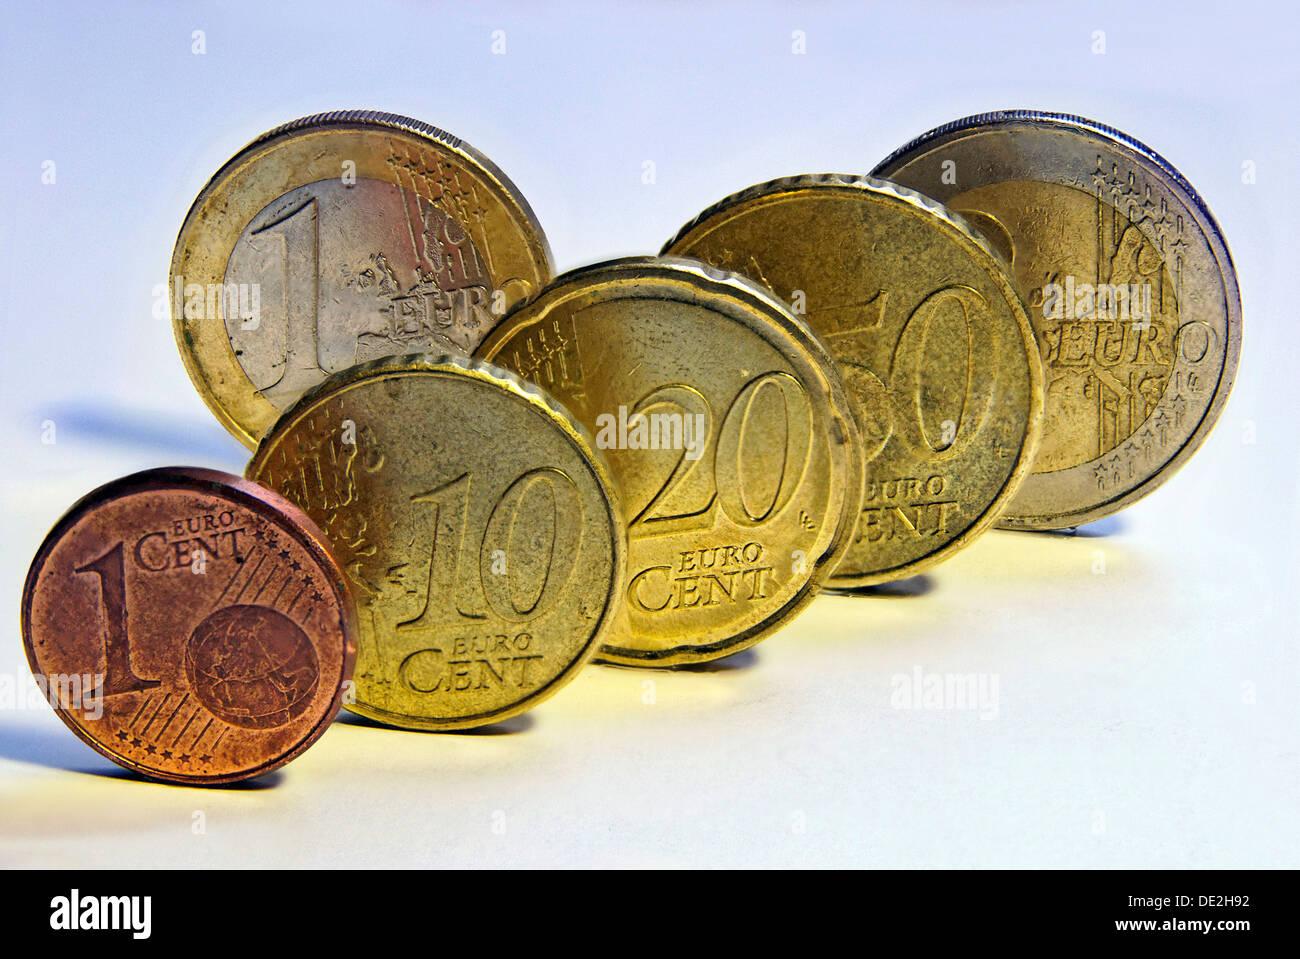 Coins new donk city ny : Mnt token login rewards